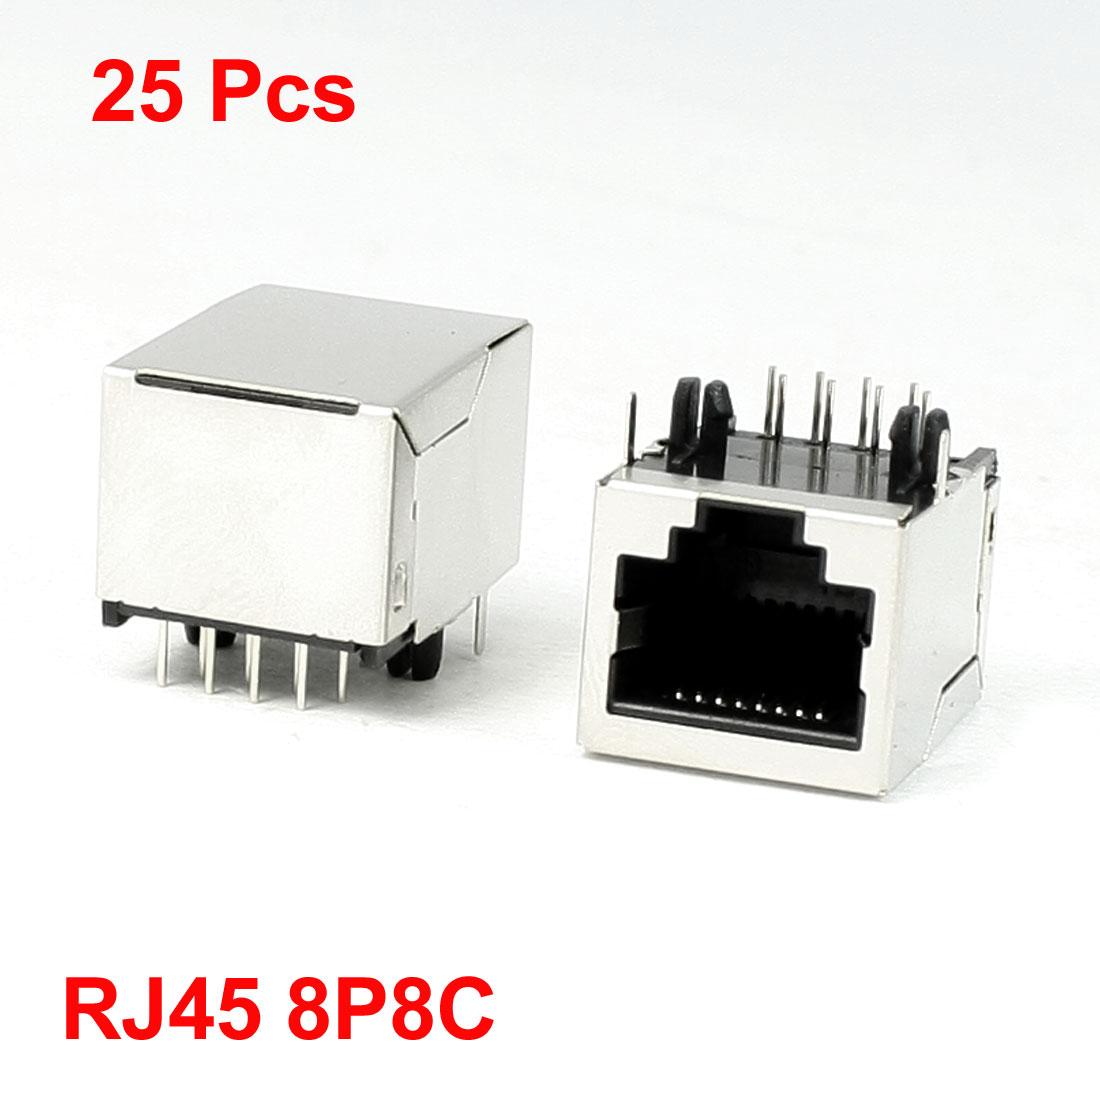 "25 Pcs Stainless Steel Shell 8P8C RJ45 PCB Jacks Connectors 0.8"" x 0.6"" x 0.55"""